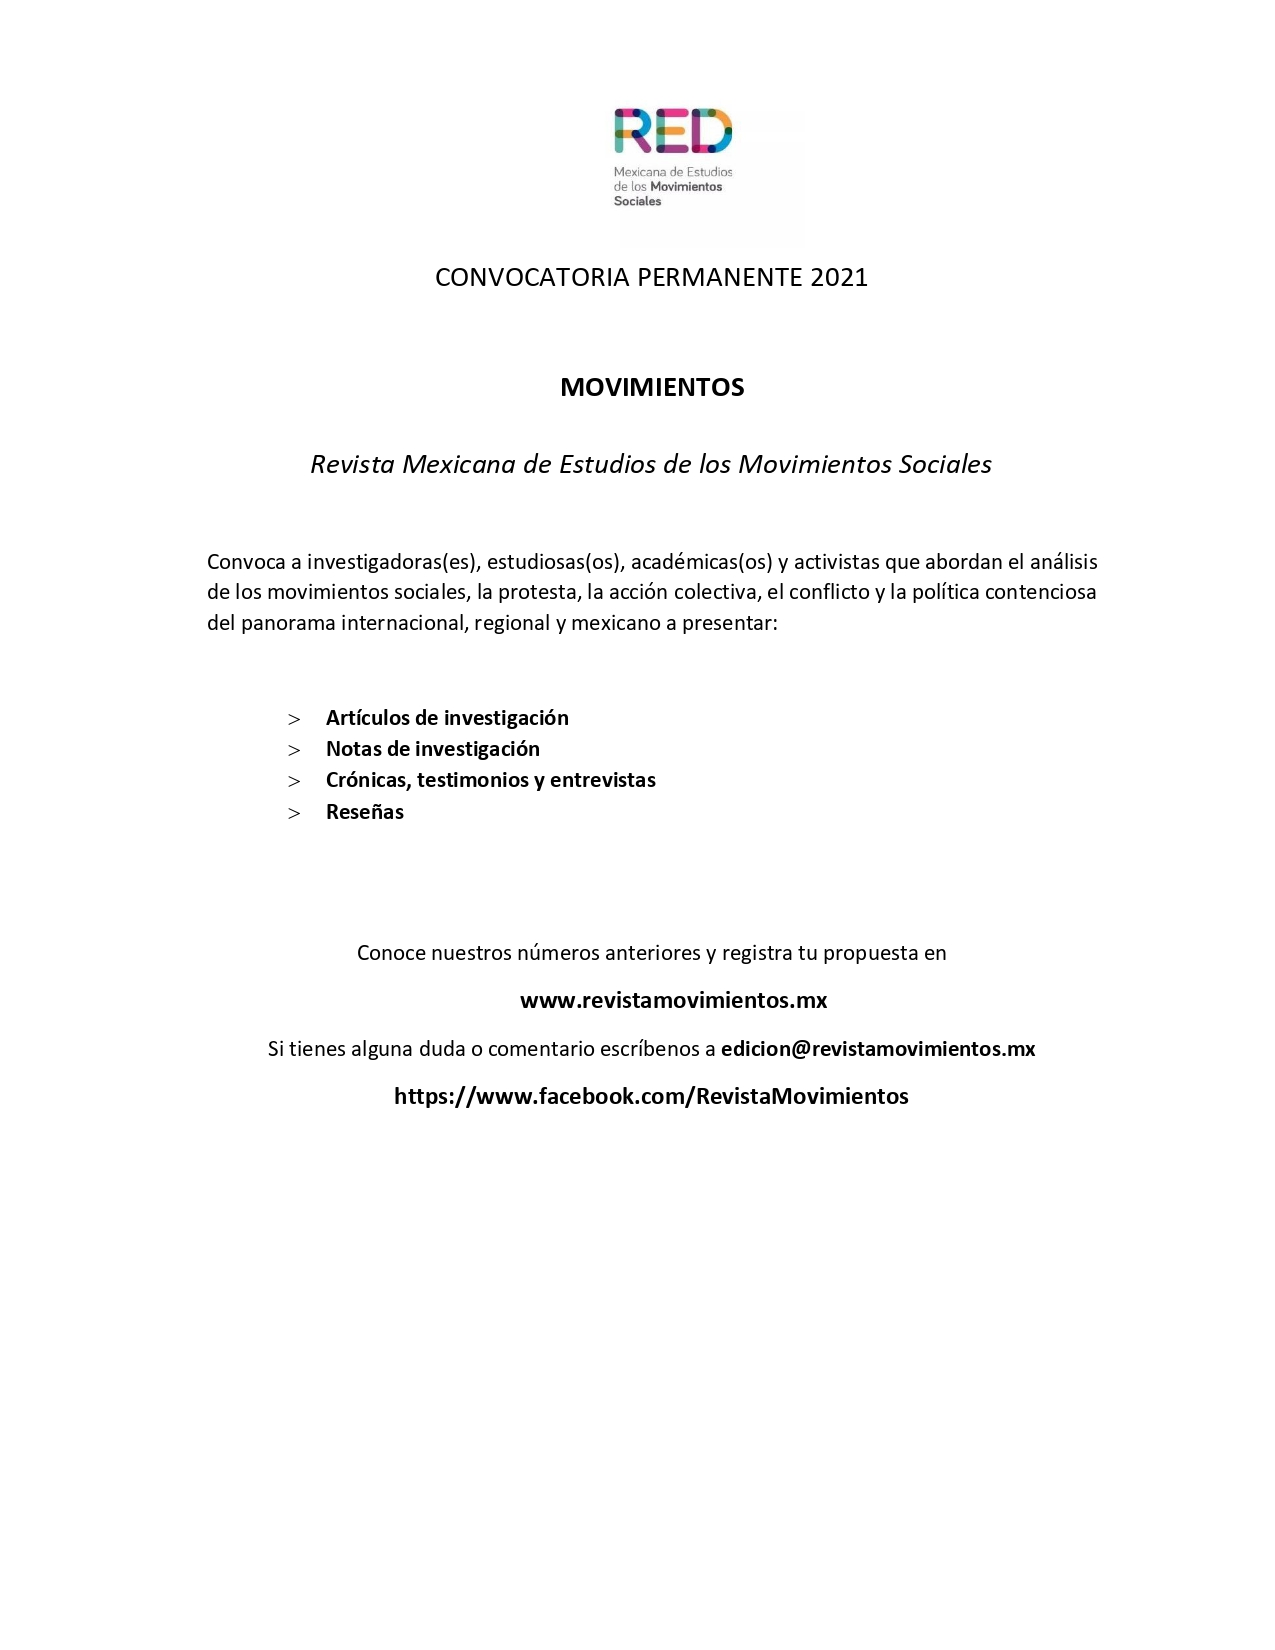 CONVOCATORIA PERMANENTE